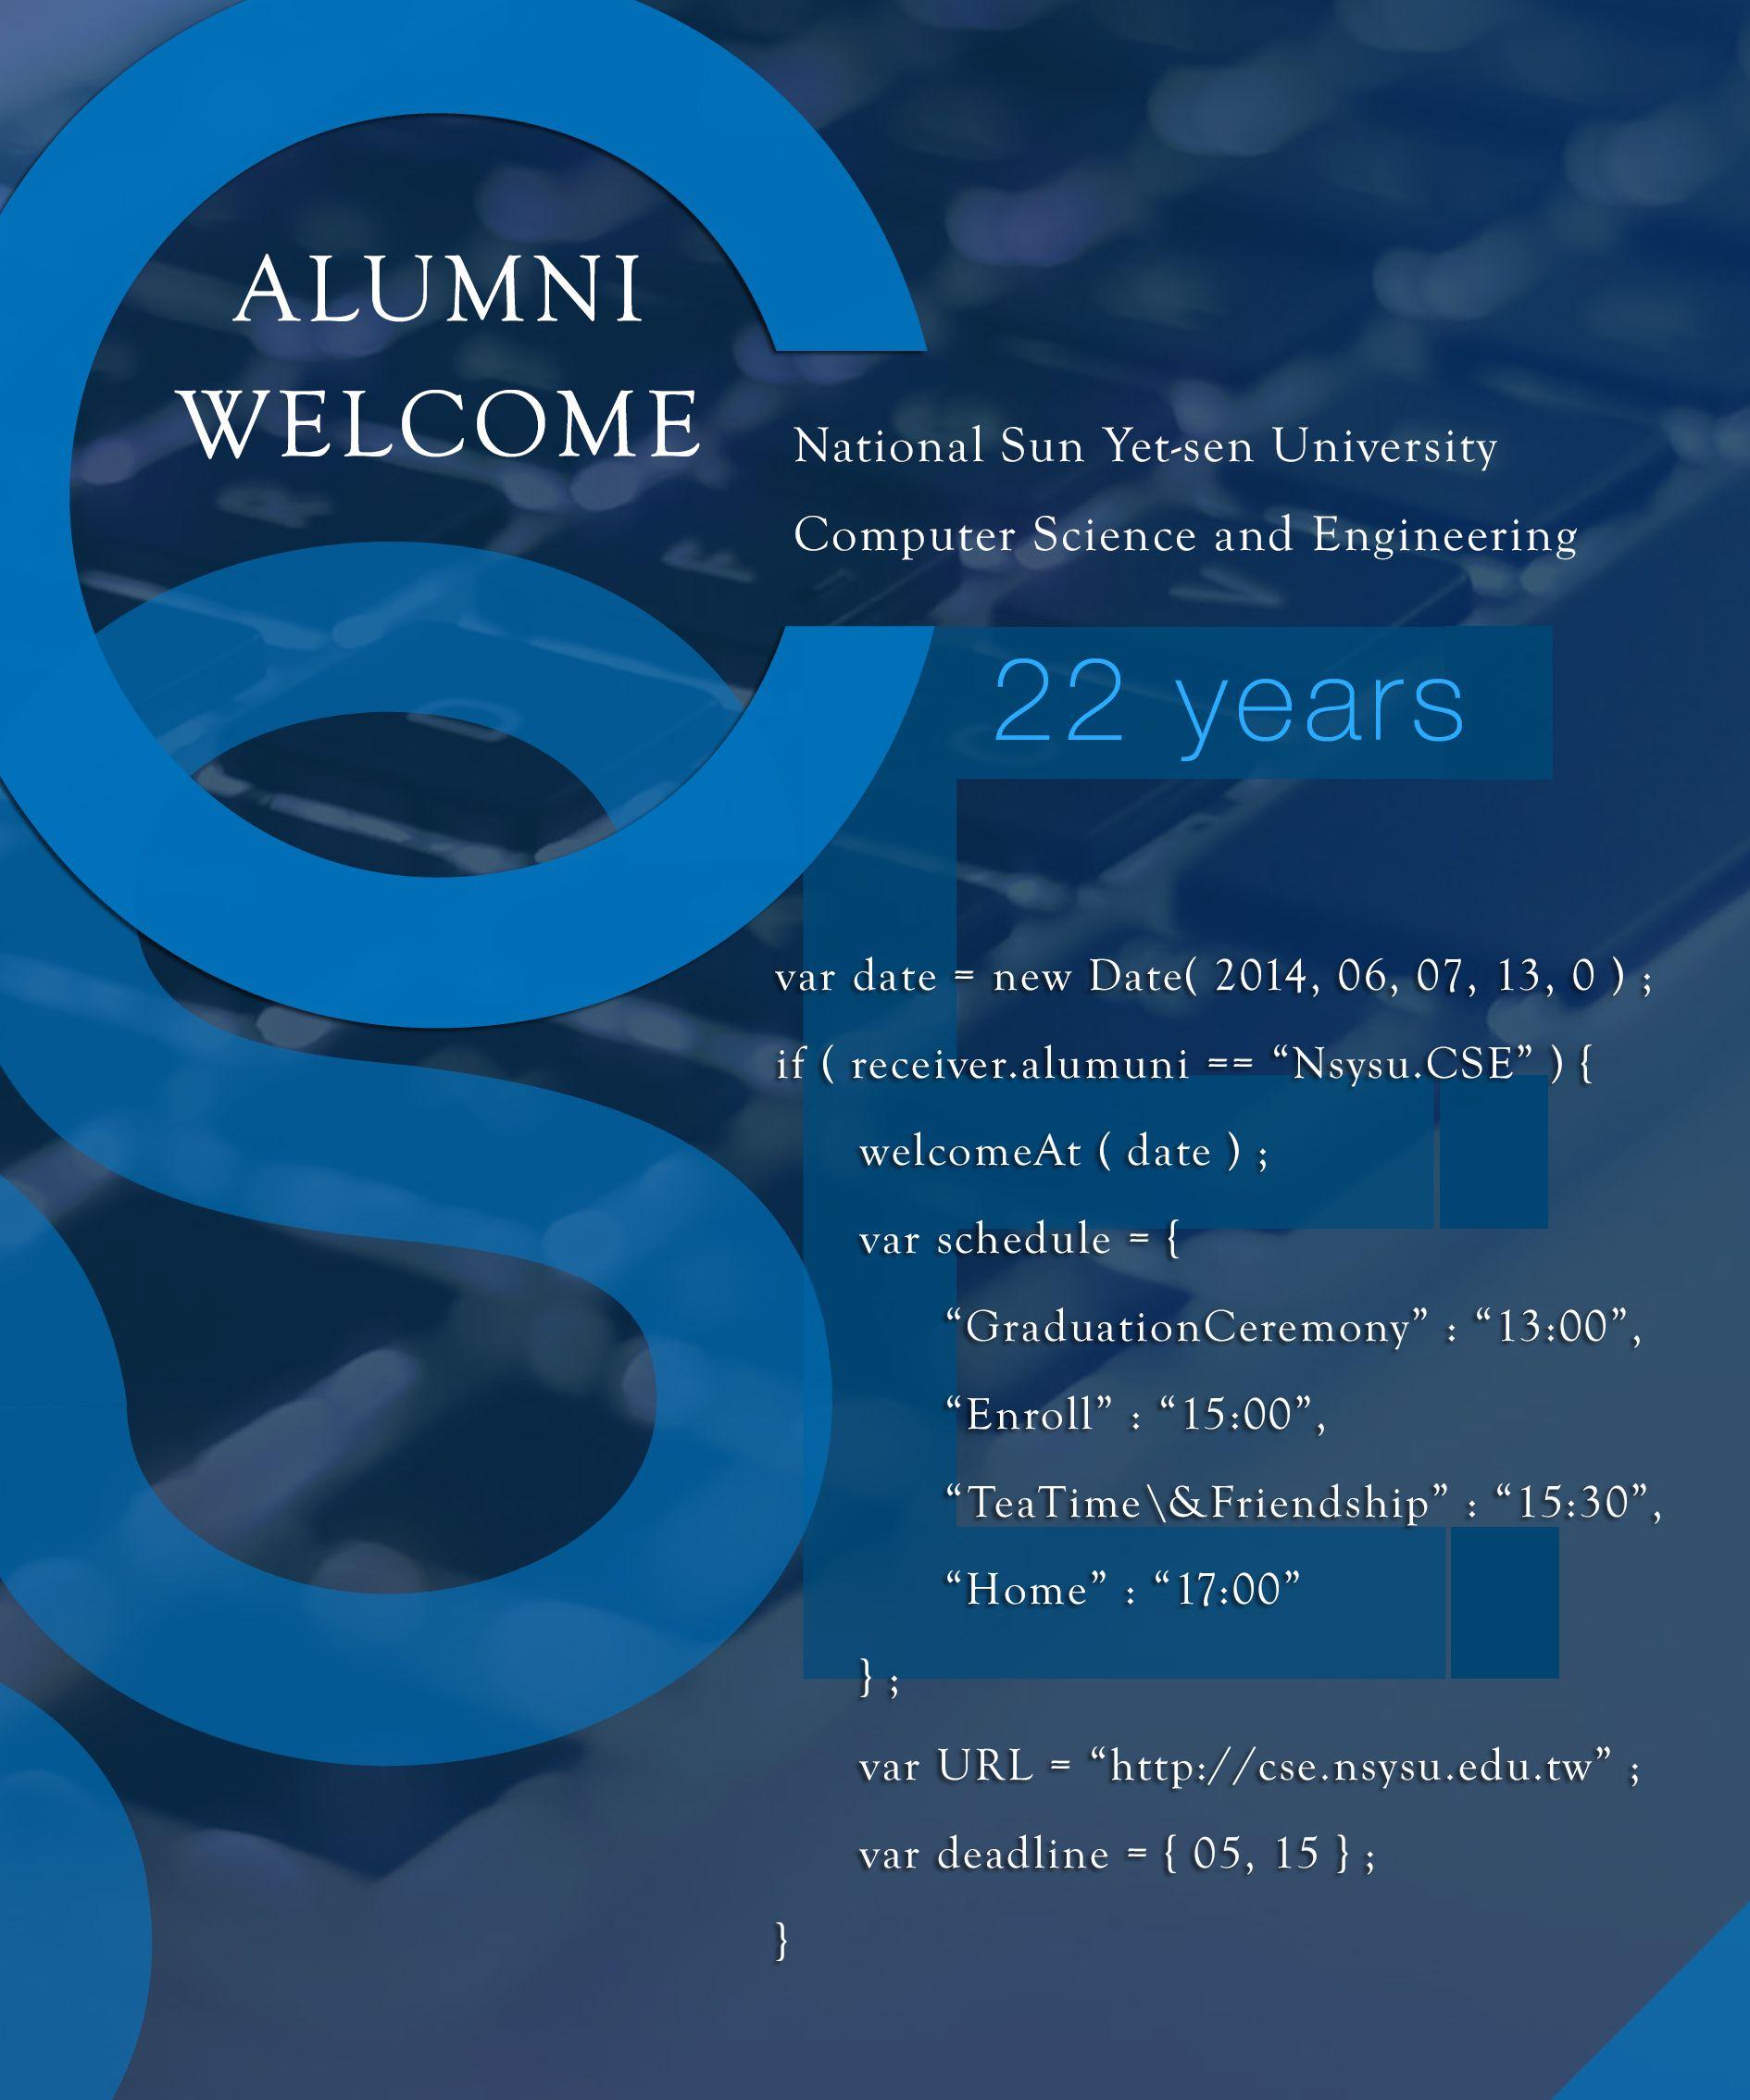 Alumni Invitation Card Design For Cse Department Use Javascript To